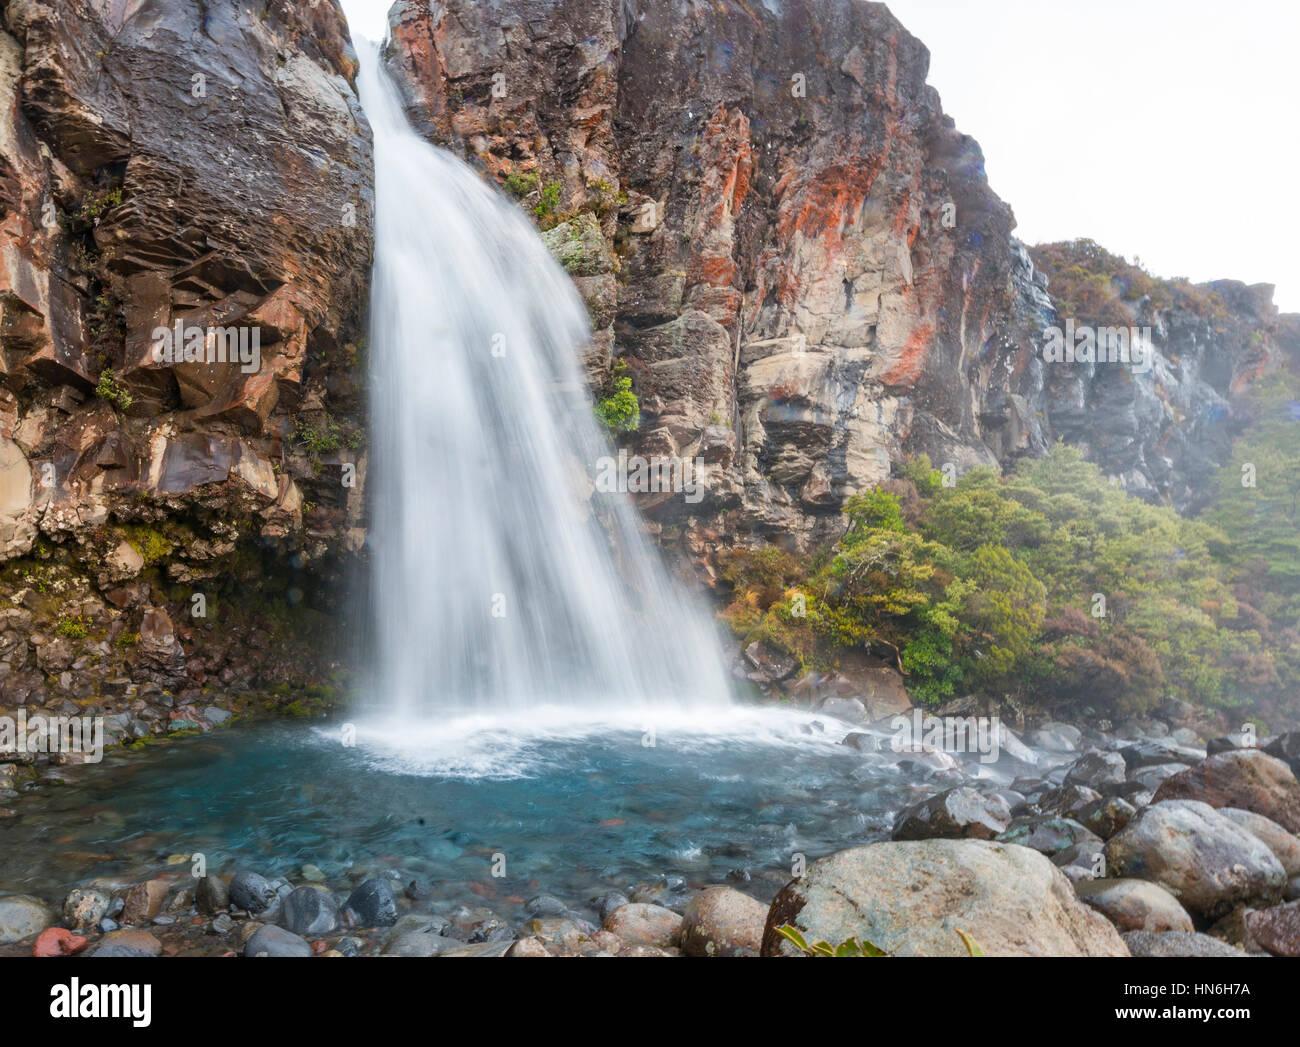 Taranaki Falls, waterfall, Tongariro National Park, North Island, New Zealand - Stock Image